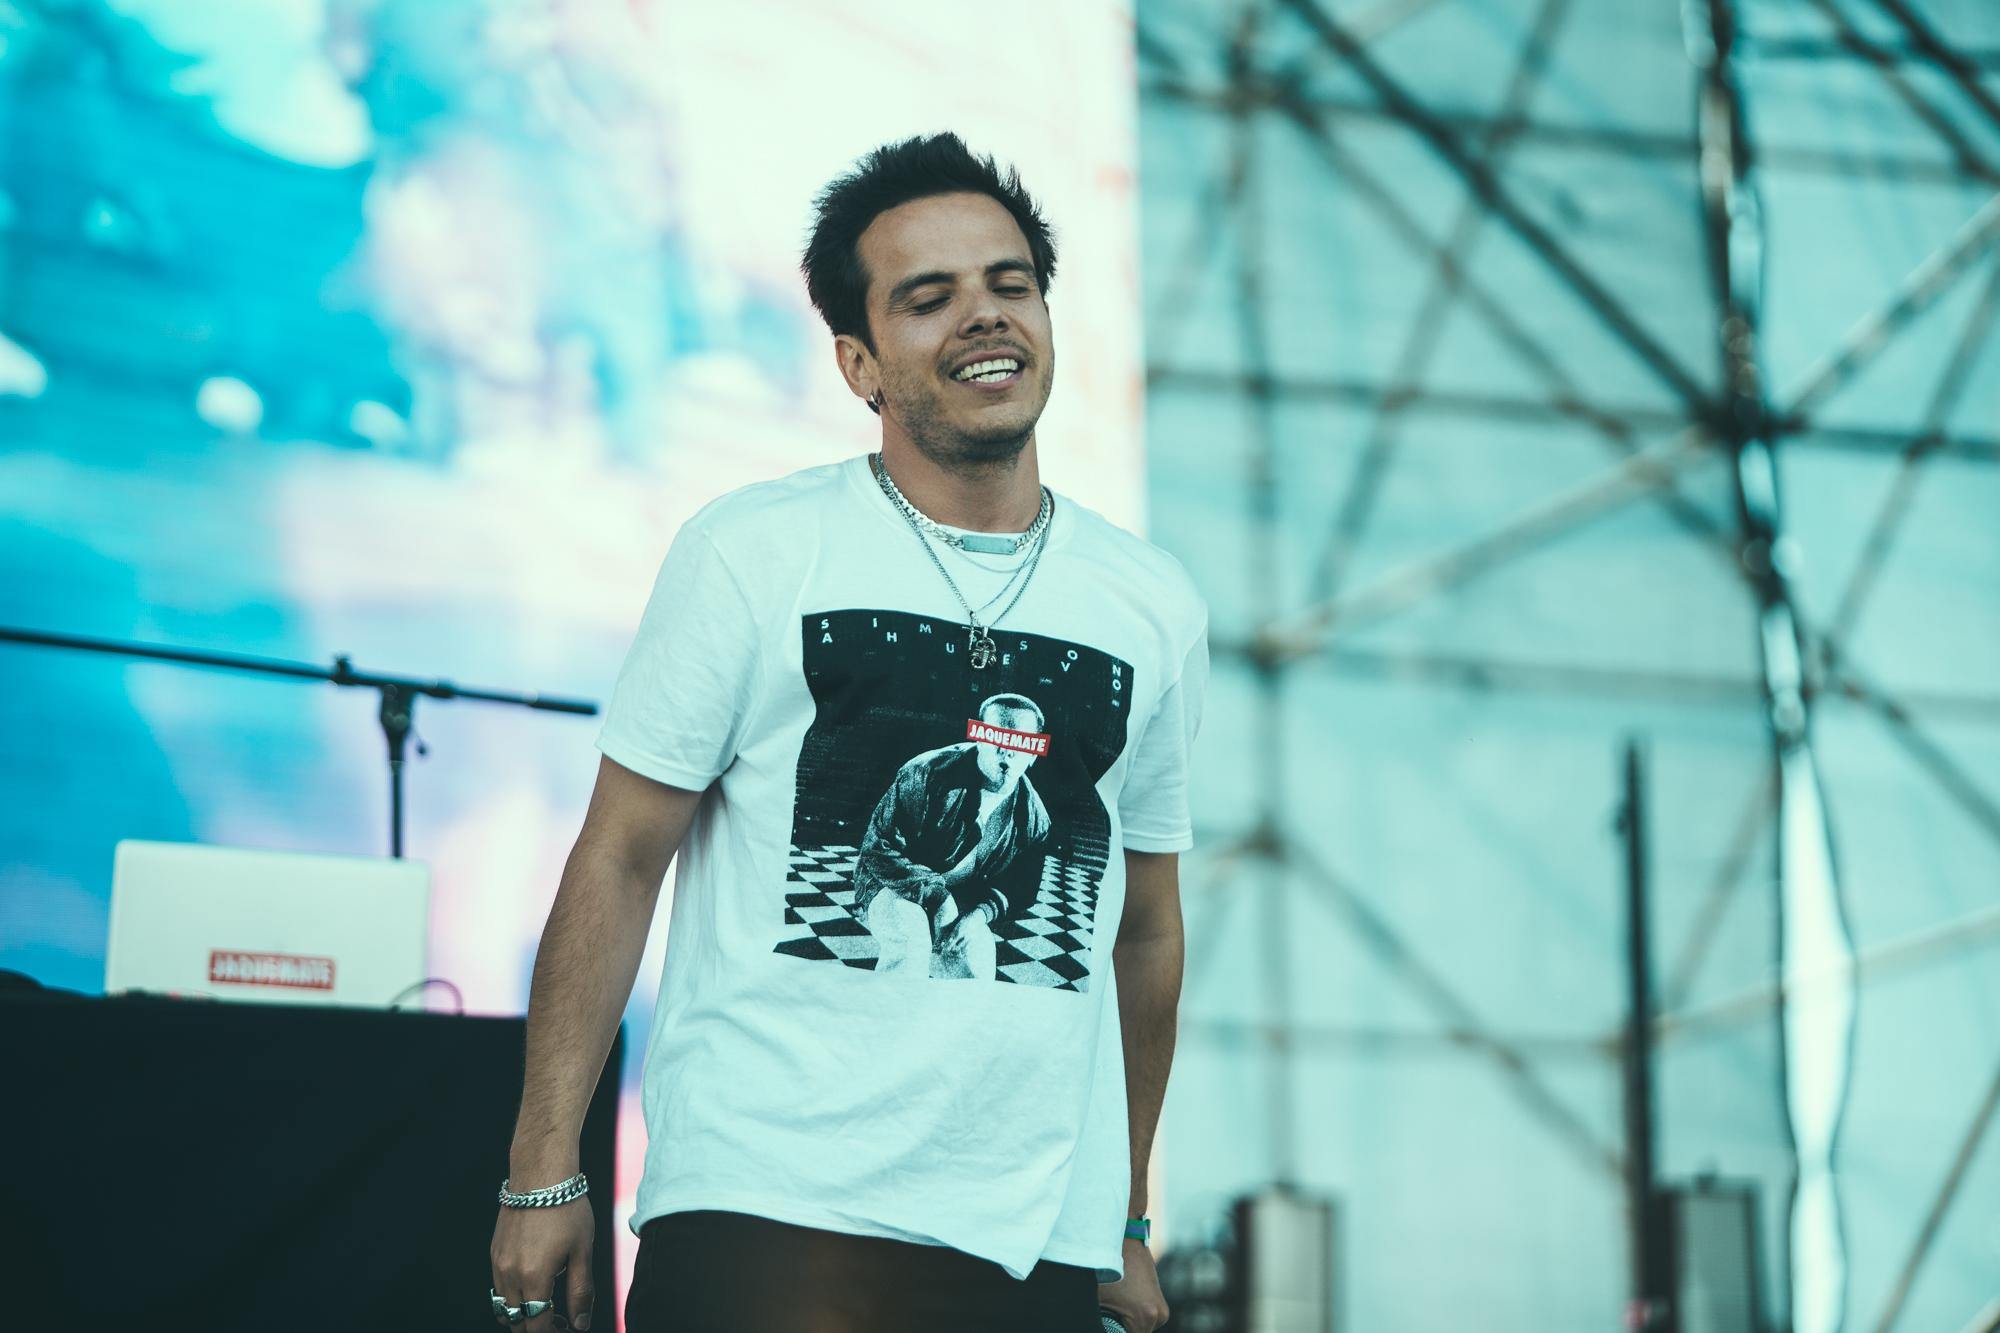 Simpson Ahuevo-Festival Ceremonia-Mexico-Foro Pegaso-04.02.2017-Daniel Patlan_Desde 1989 (11 of 19).jpg